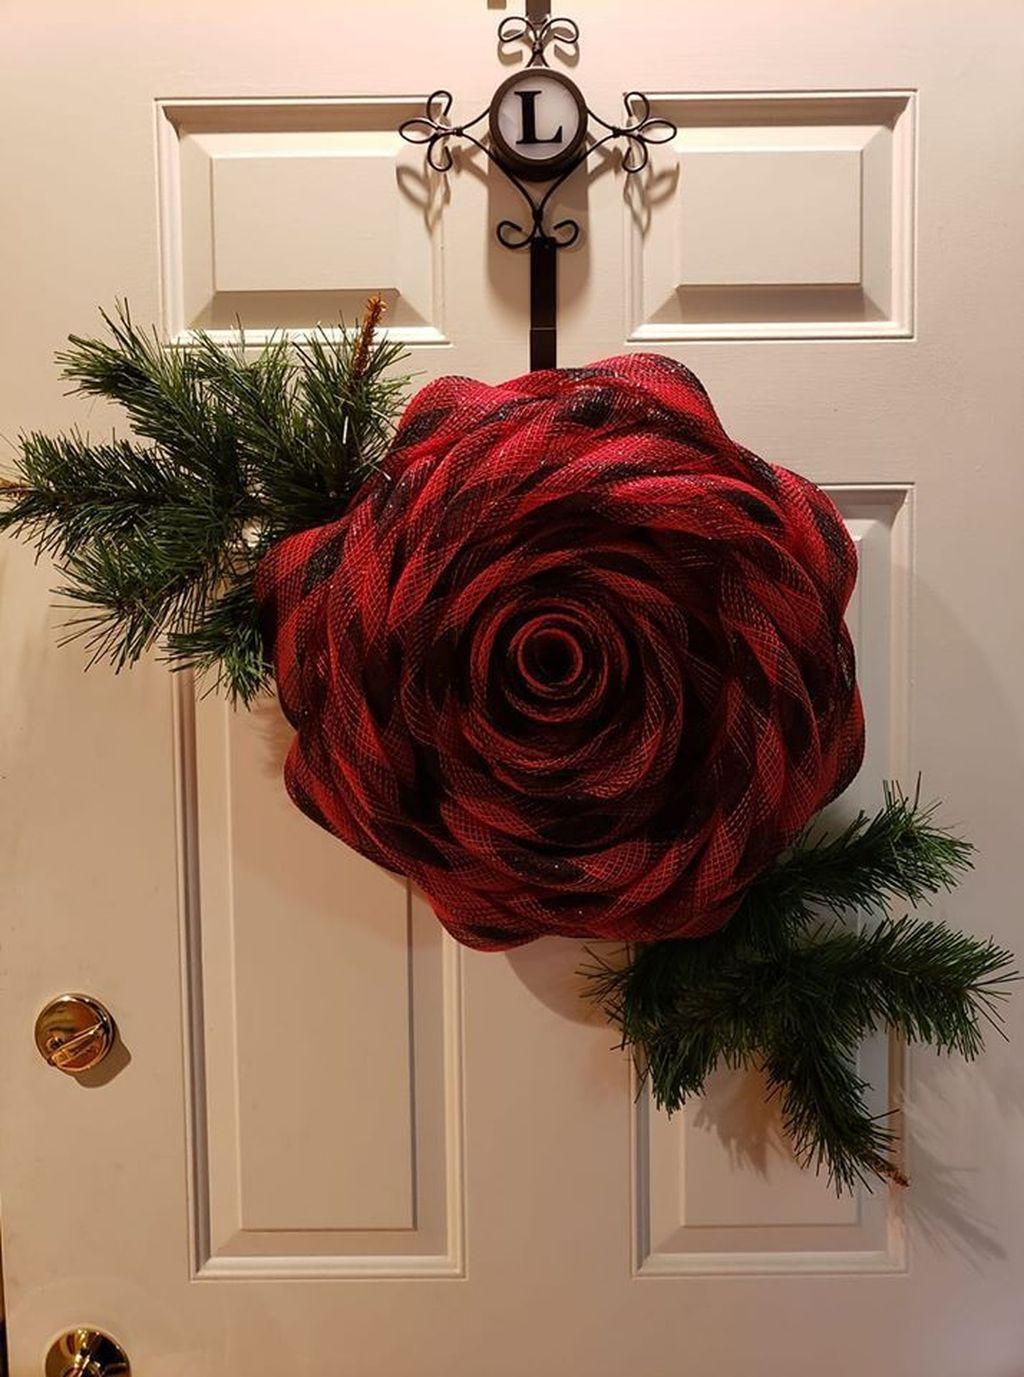 35 fabulous winter wreaths design ideas best for your